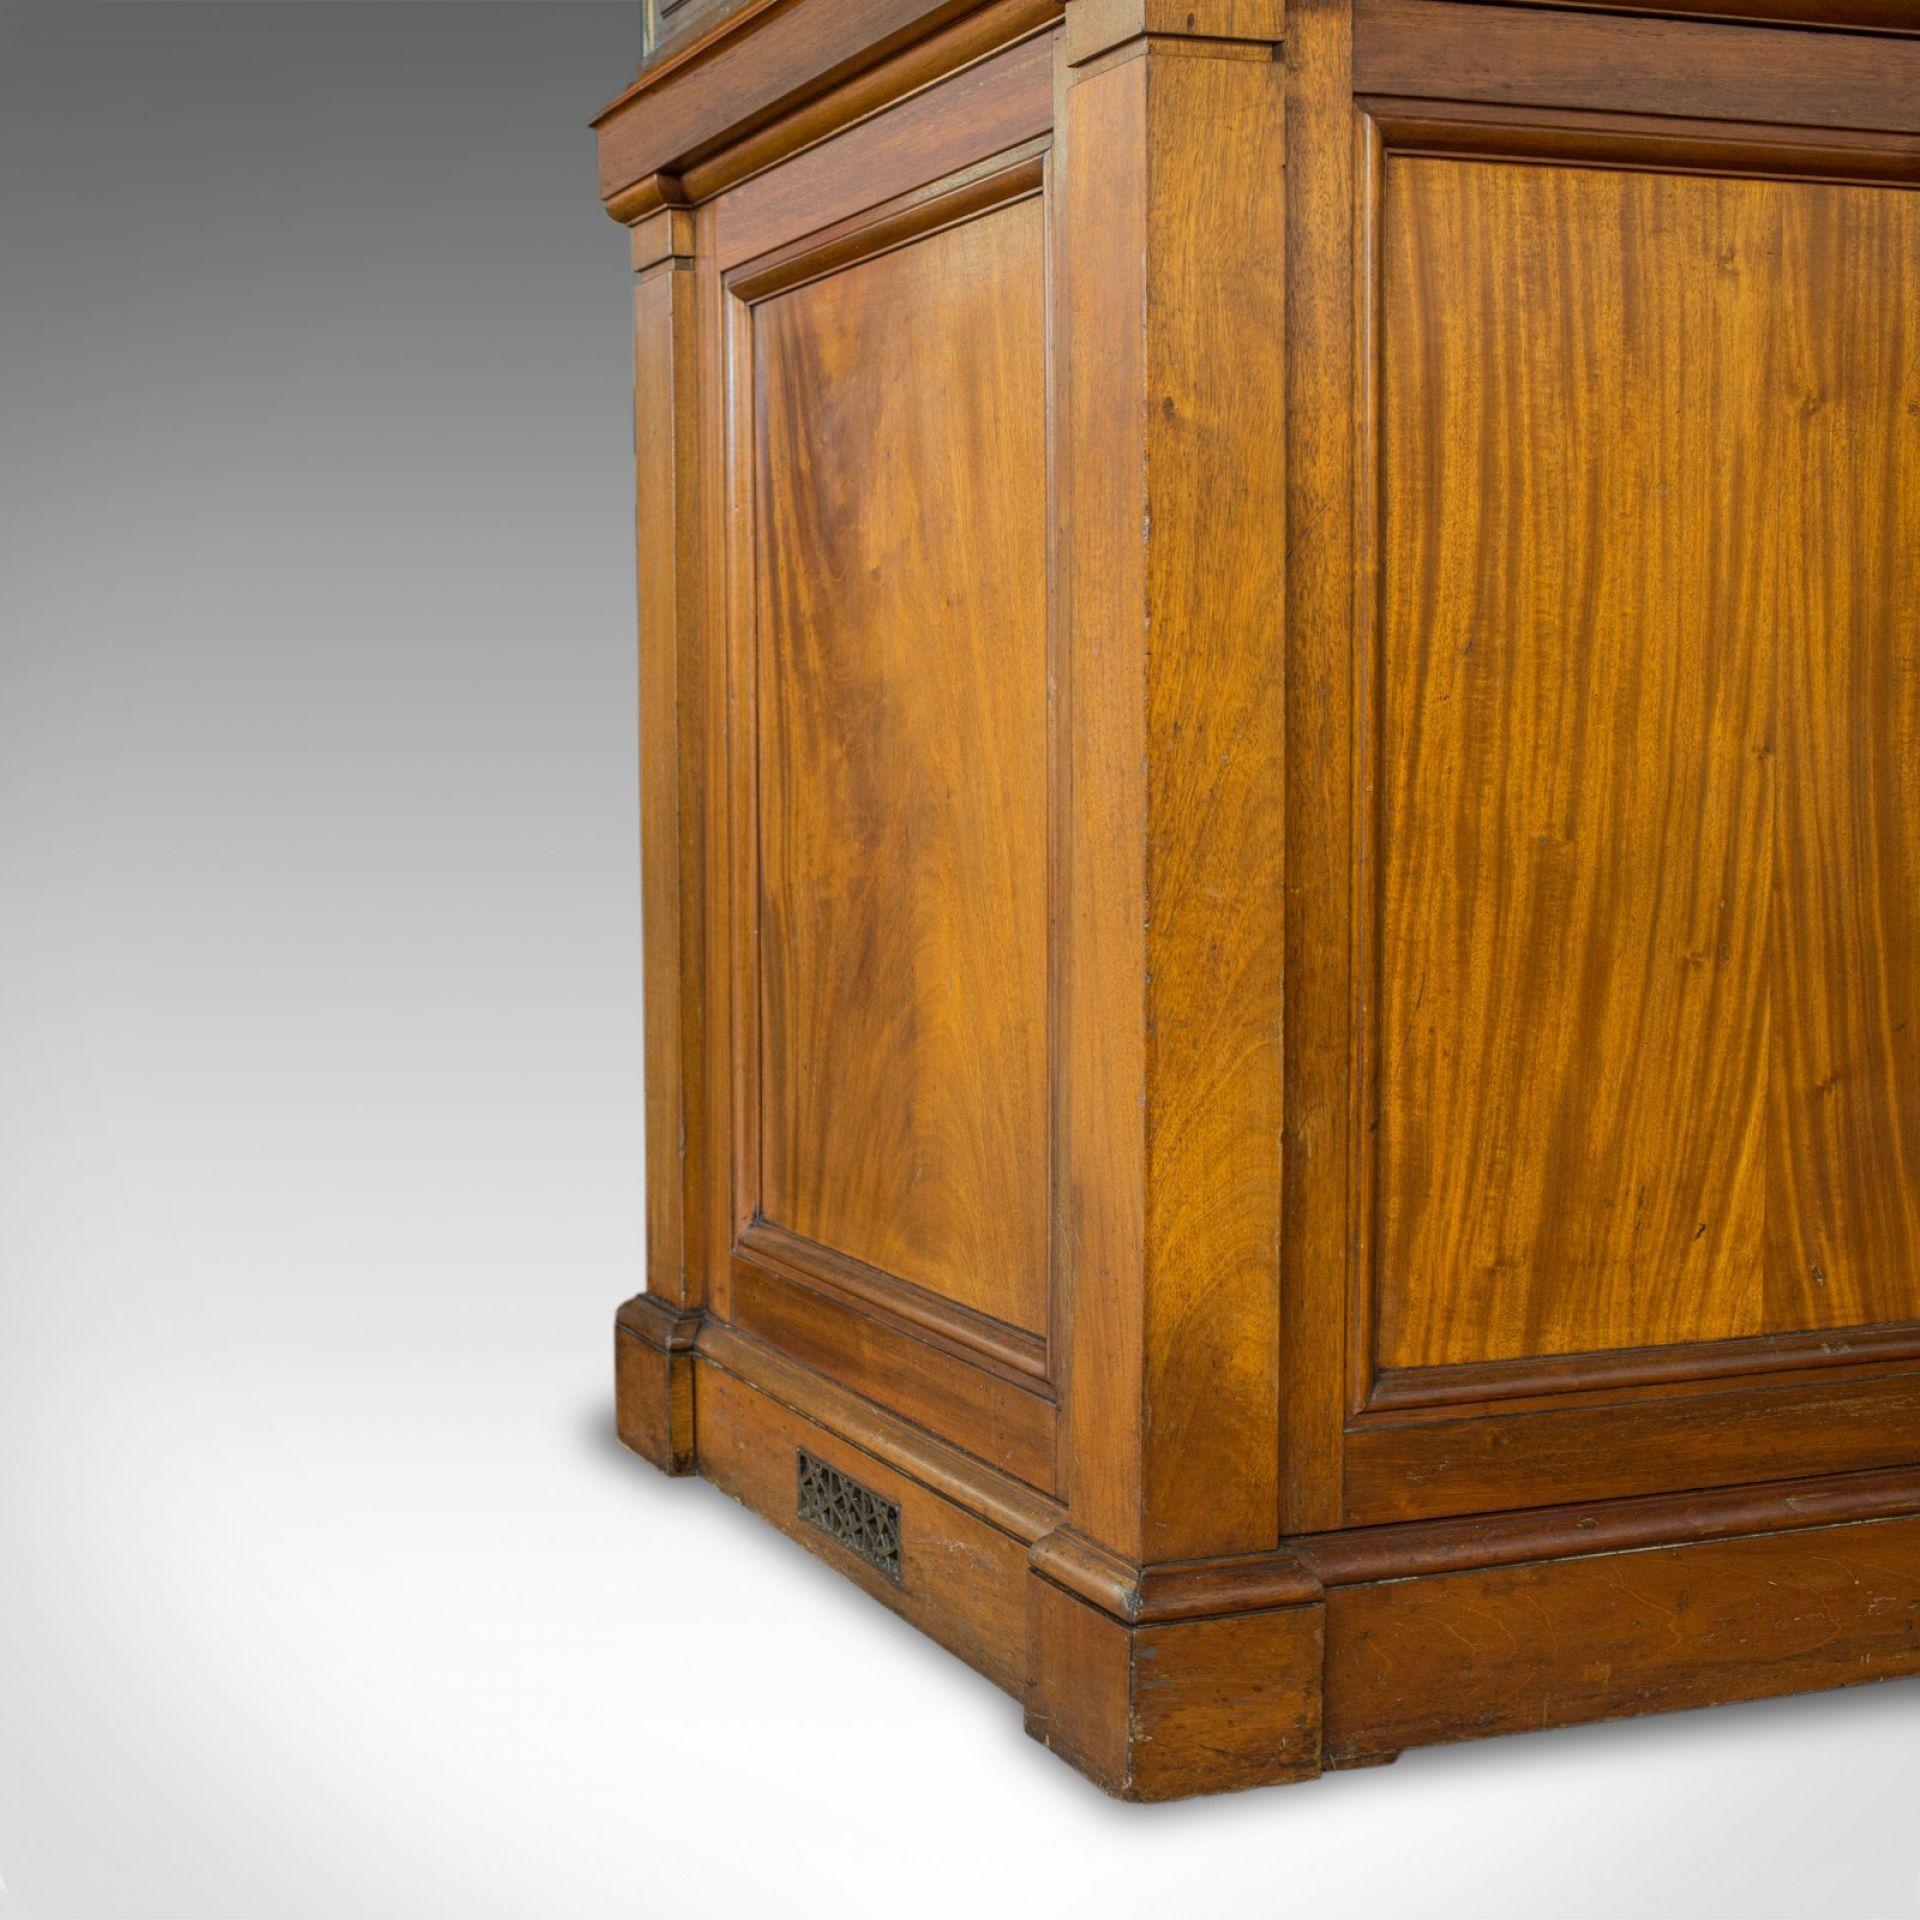 Antique Showcase Cabinet, English, Walnut, Bronze, Display, Museum, Circa 1900